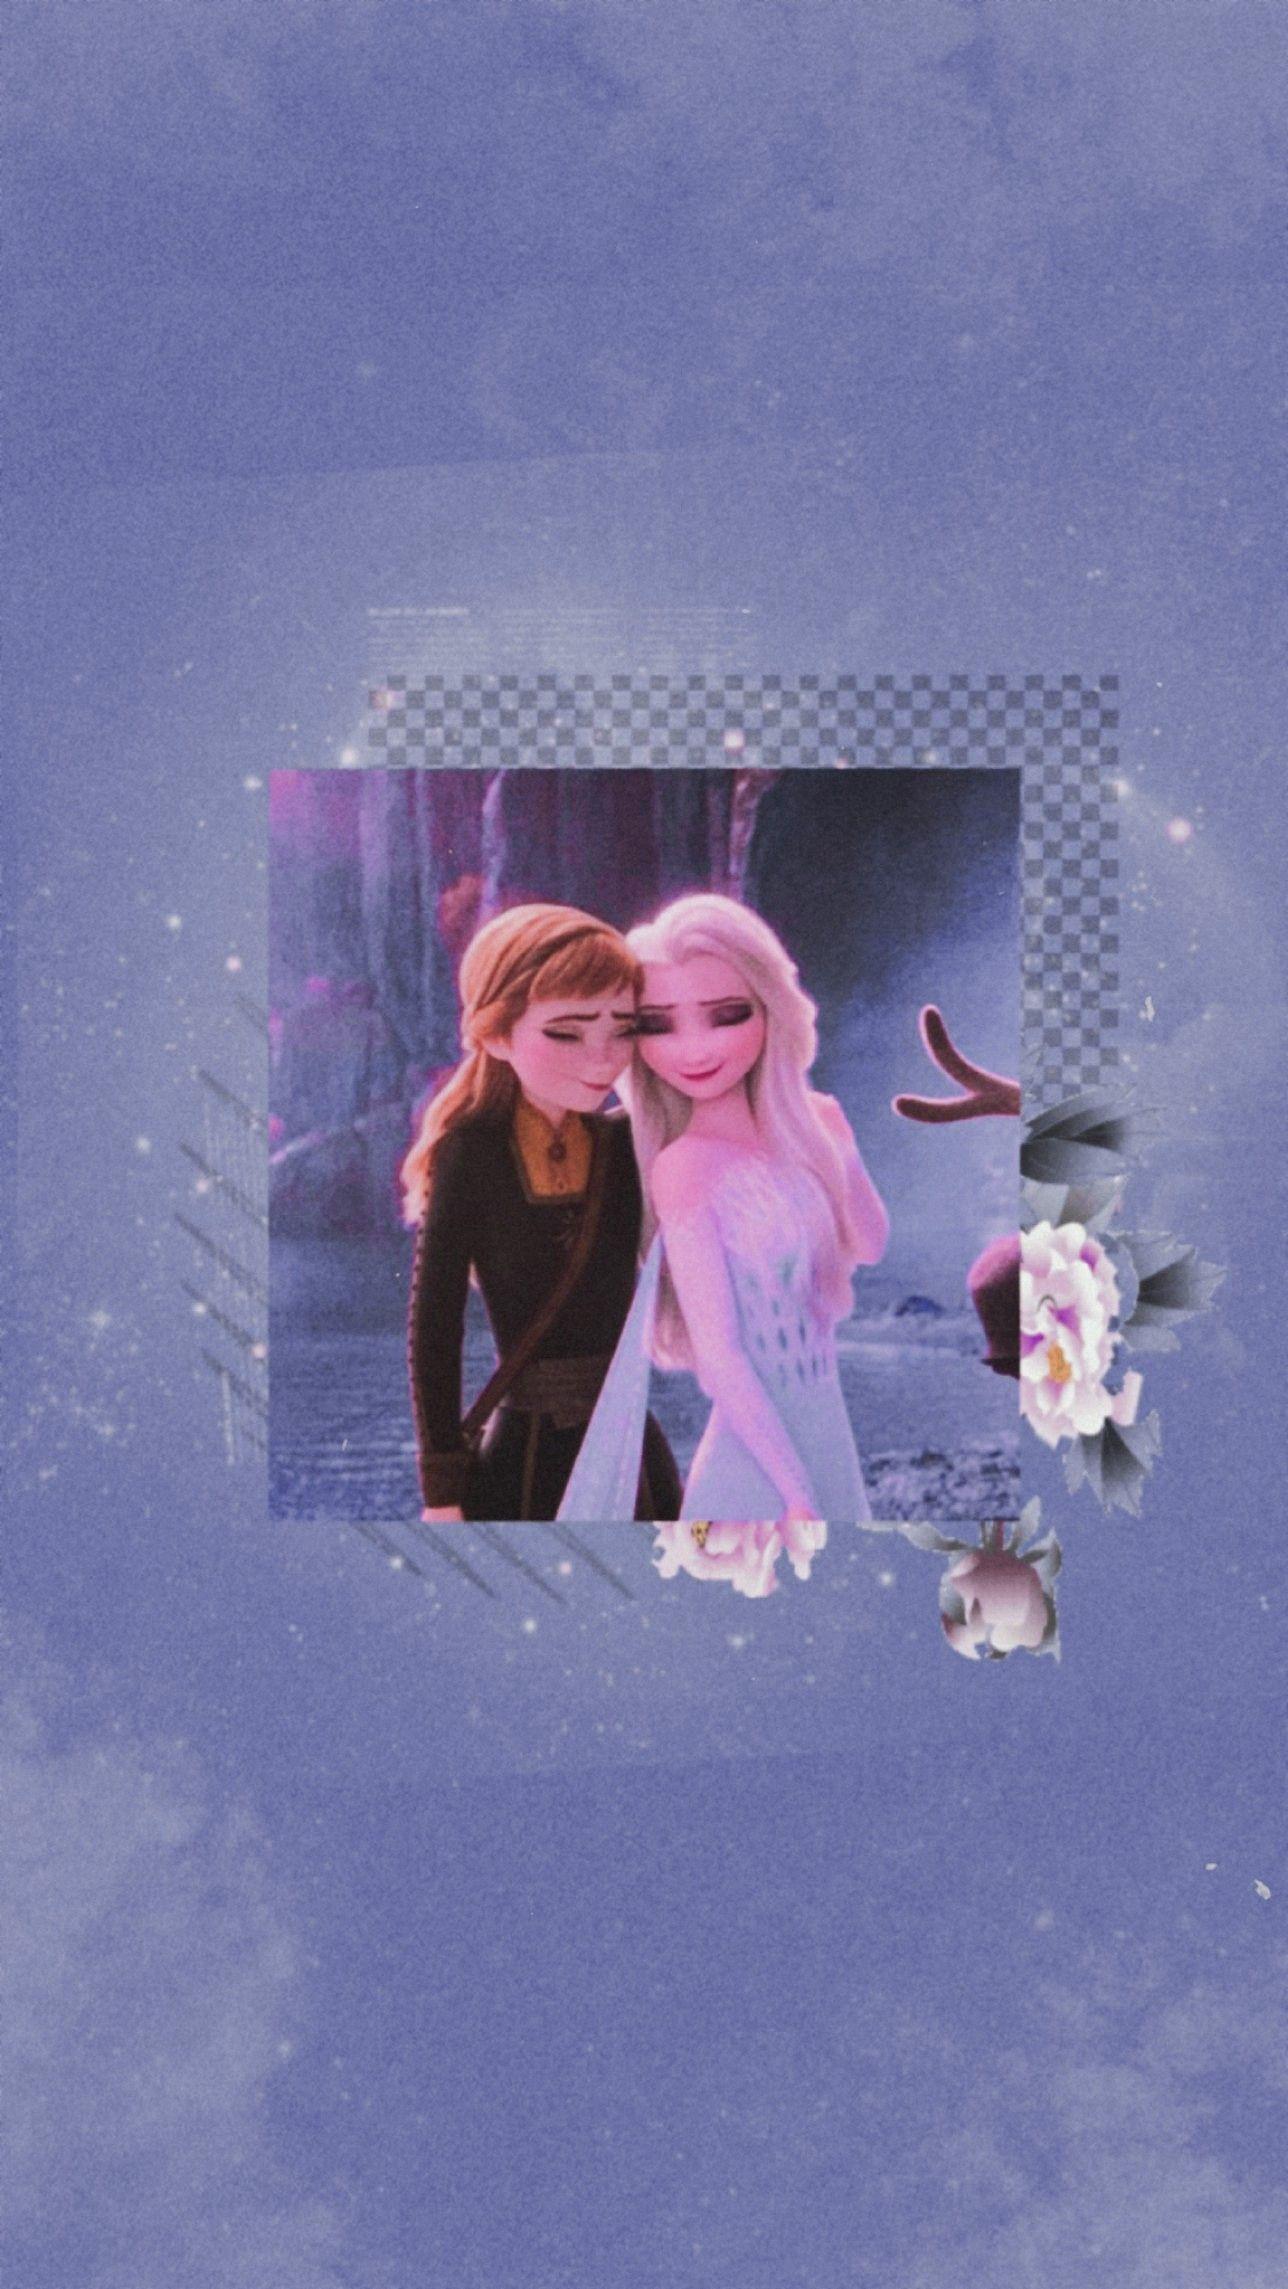 Wallpaper Lockscreen Frozen Di 2020 Gambar Wajah Putri Disney Kartun Disney